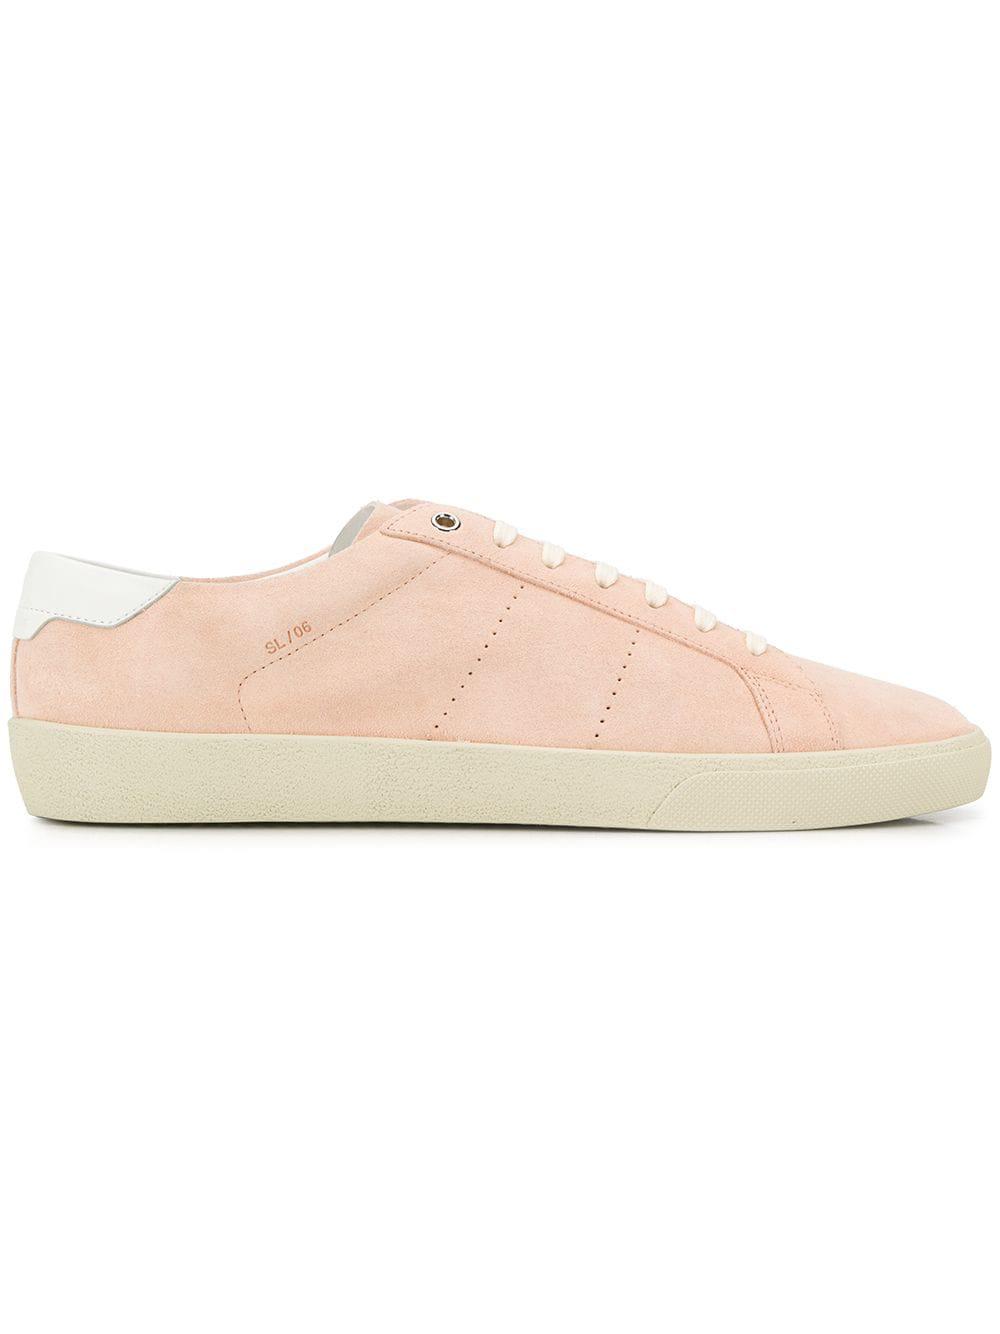 8cdad642c9bc4 Saint Laurent Pink Suede Court Classic Sl 06 Sneakers. Farfetch